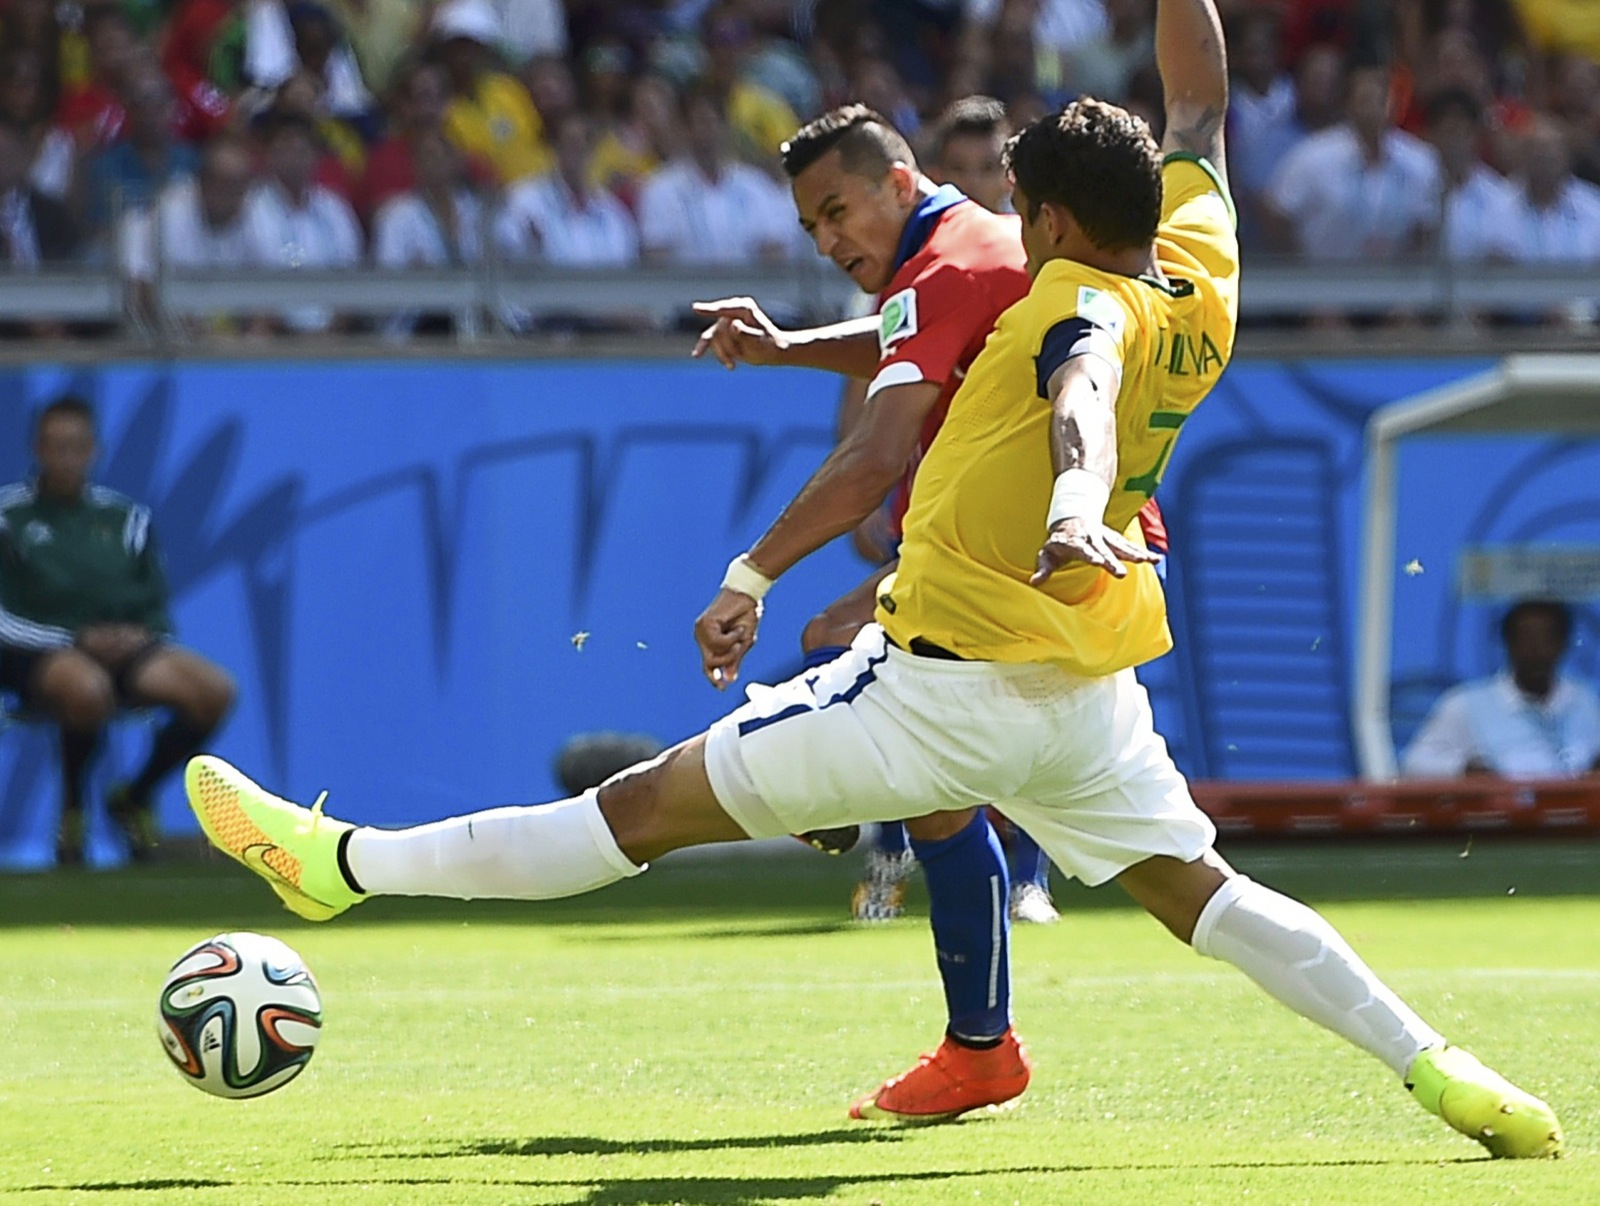 Chile's Alexis Sanchez scores goal to tie game at 1-1. REUTERS/Dylan Martinez